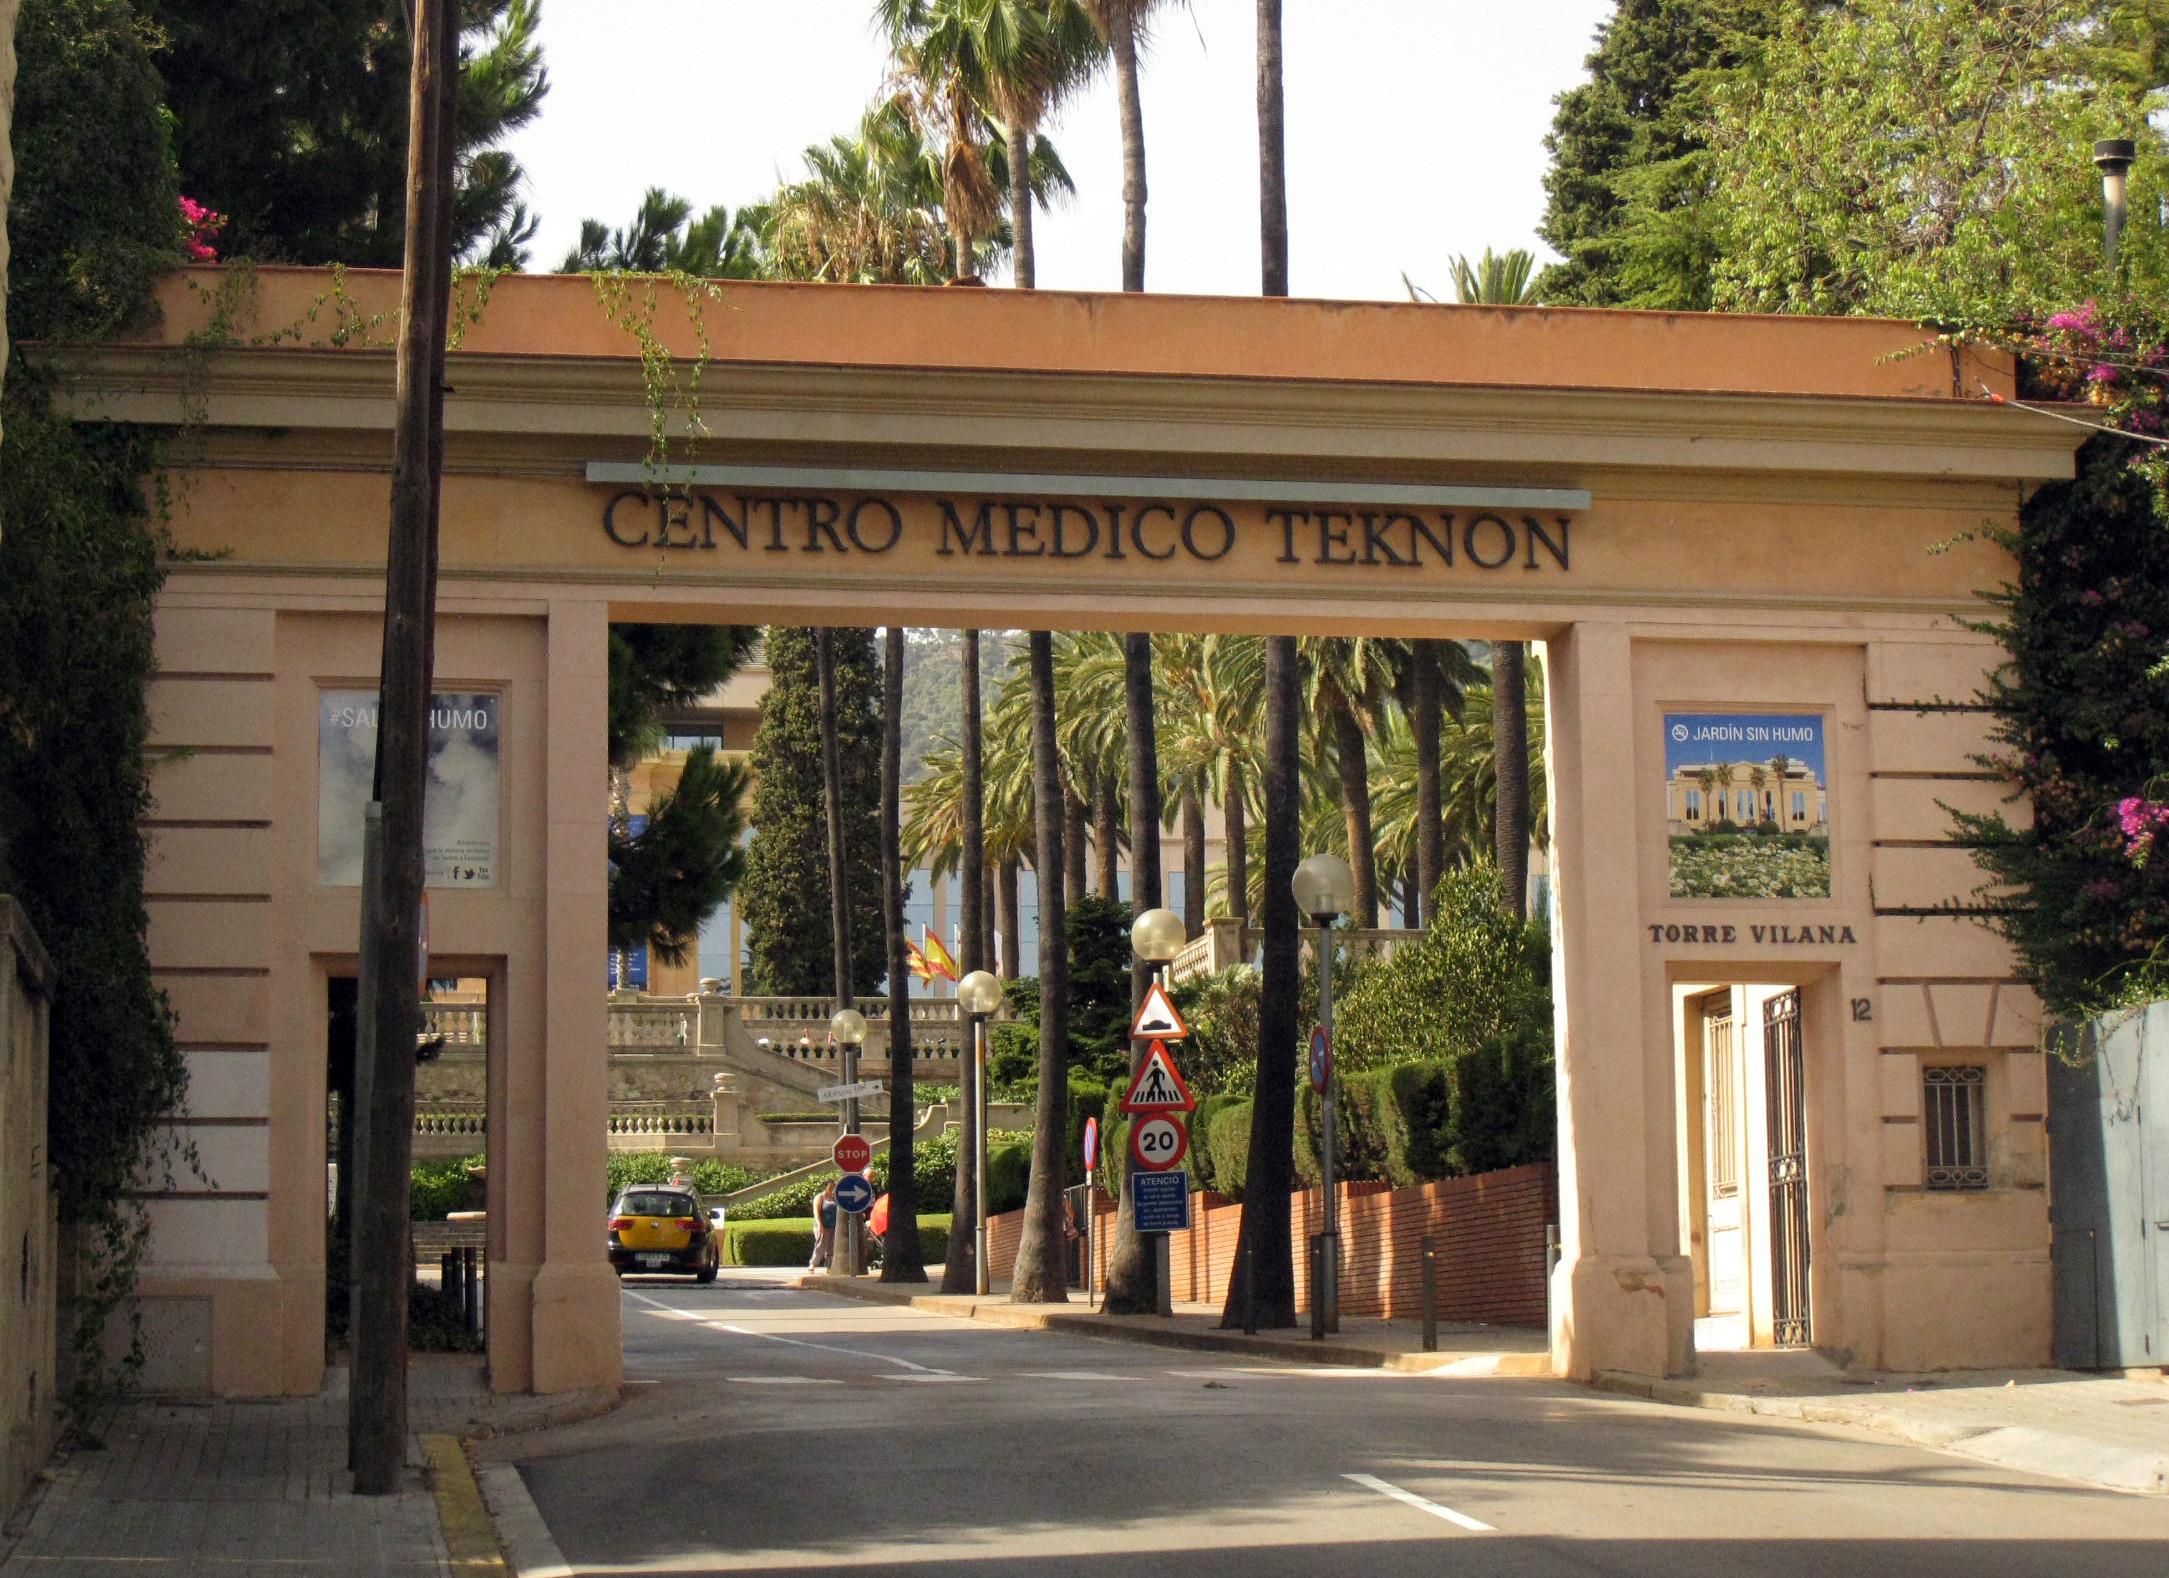 El Centre Mèdic Teknon | Wikimedia Commons